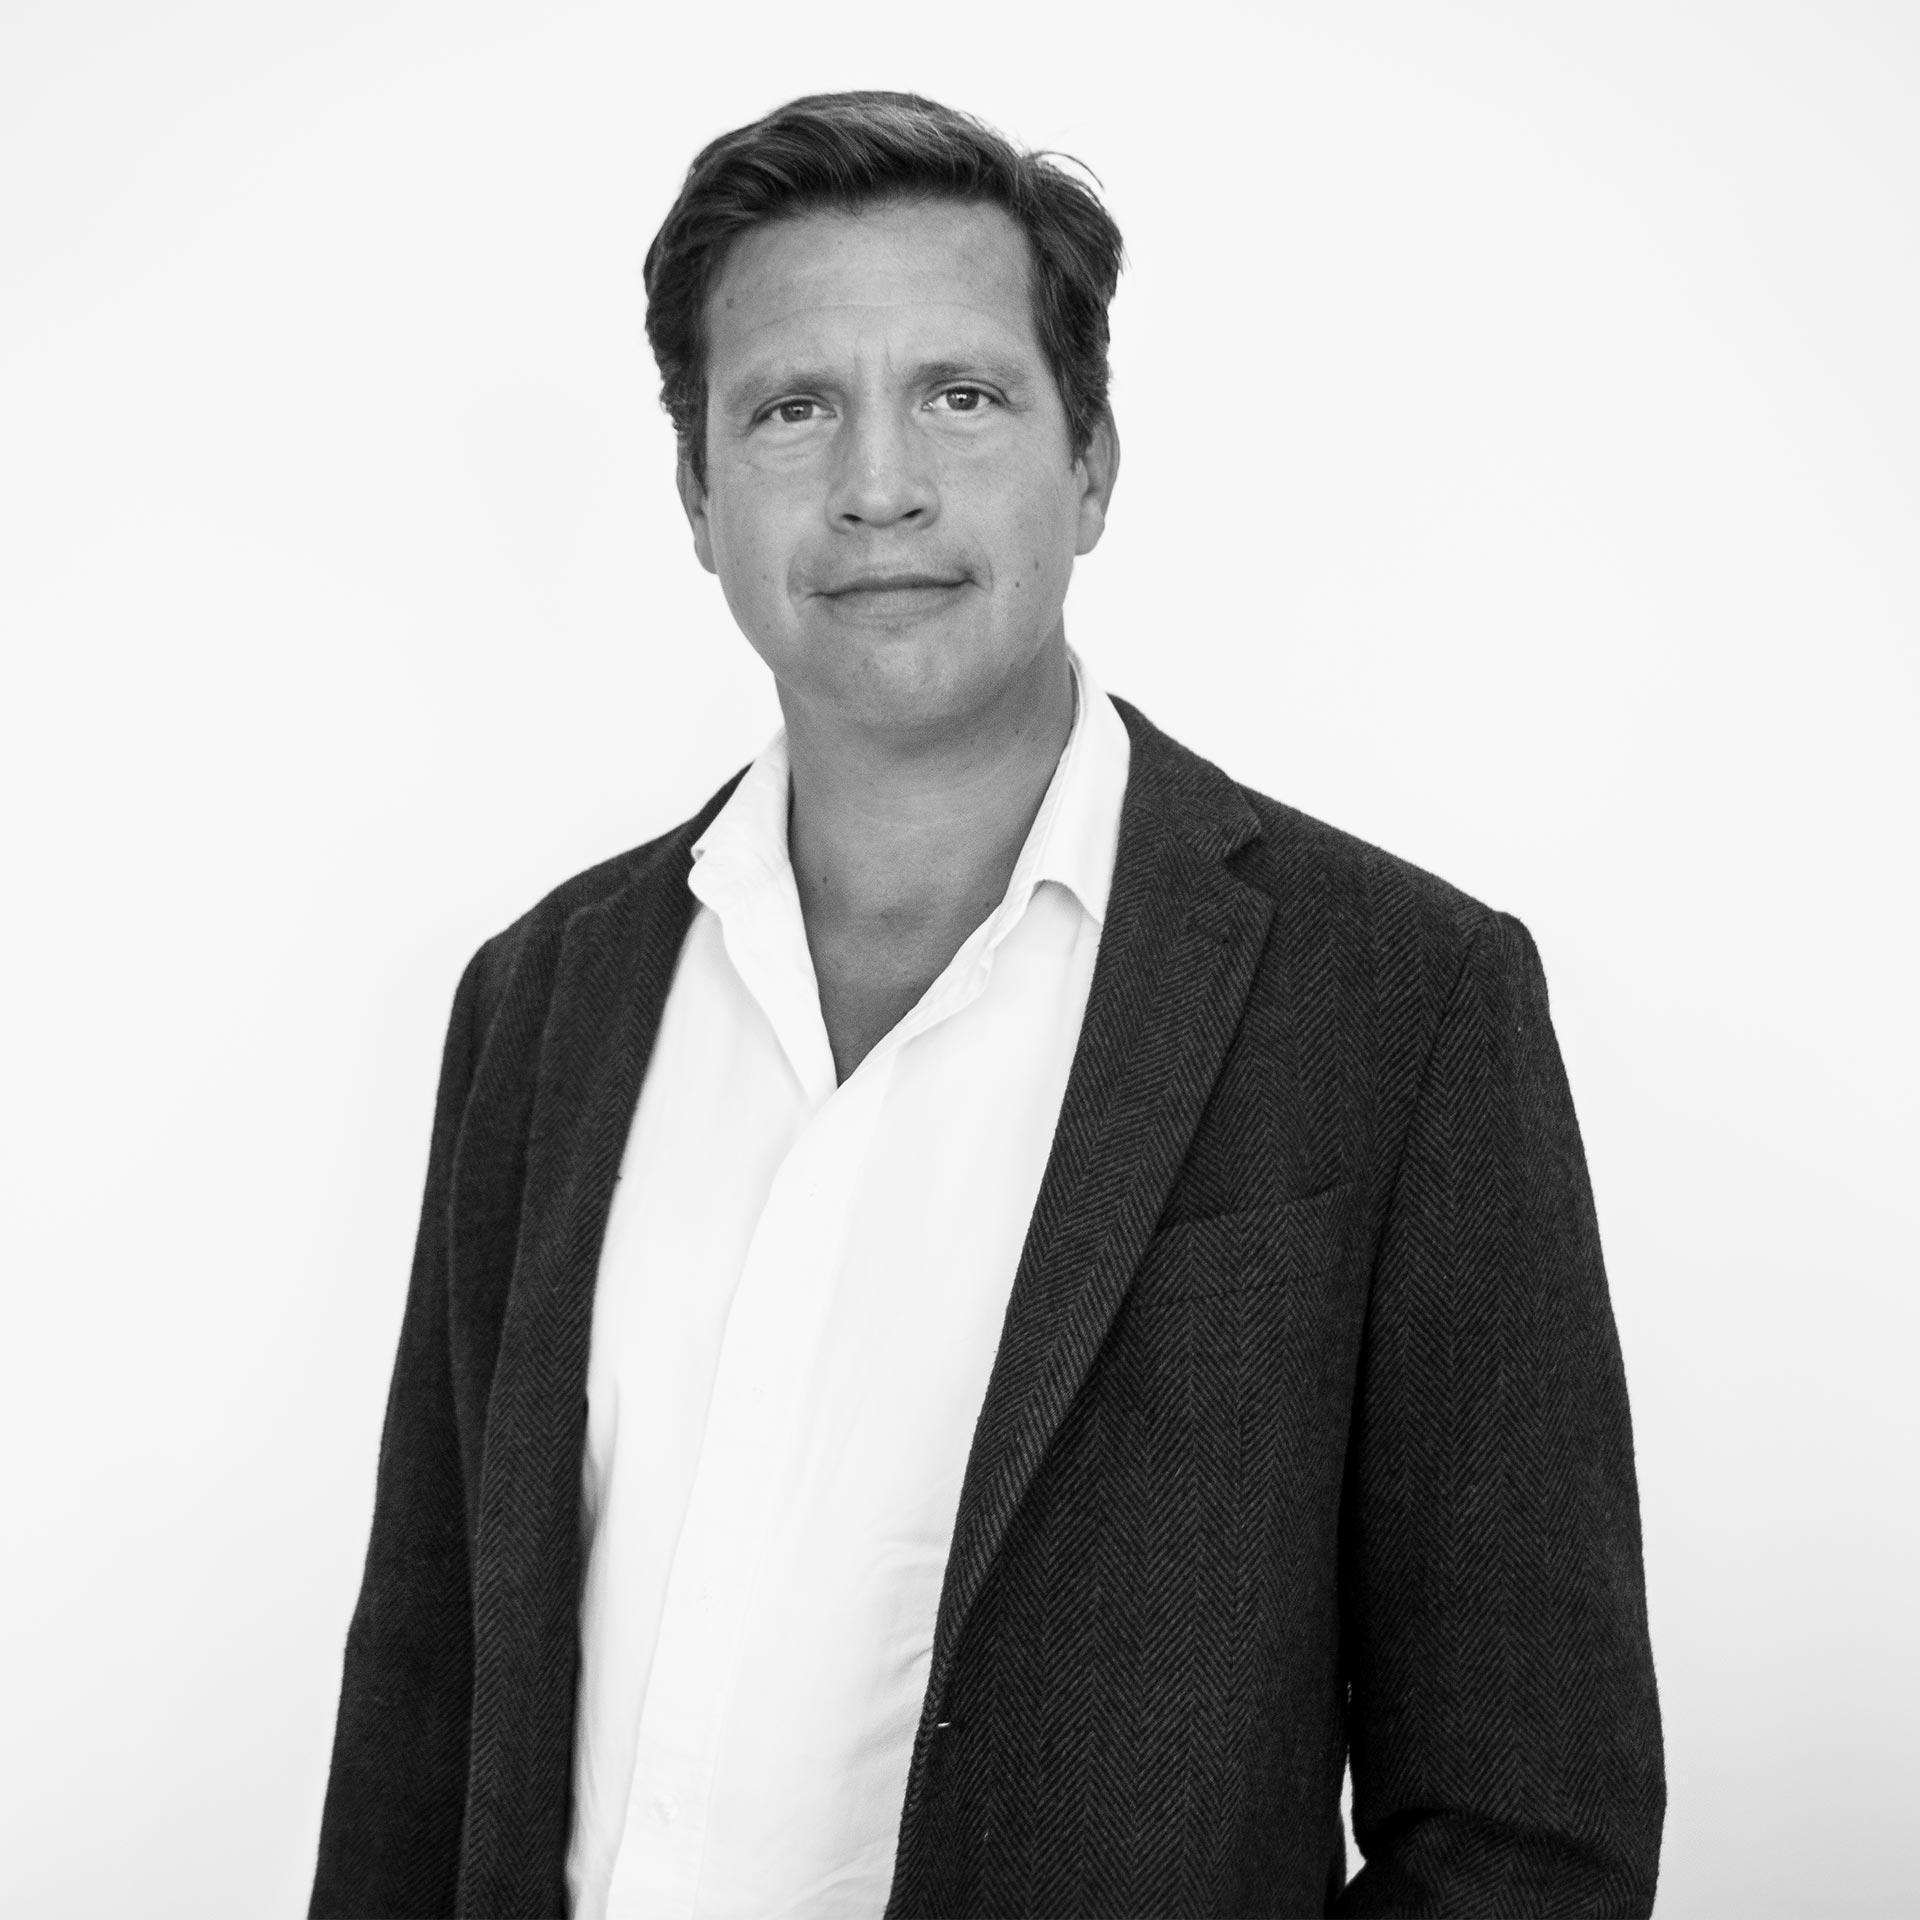 Award Winning Marketing Agency   Julian Kingsland, Director & Co-founder   Kingsland Linassi